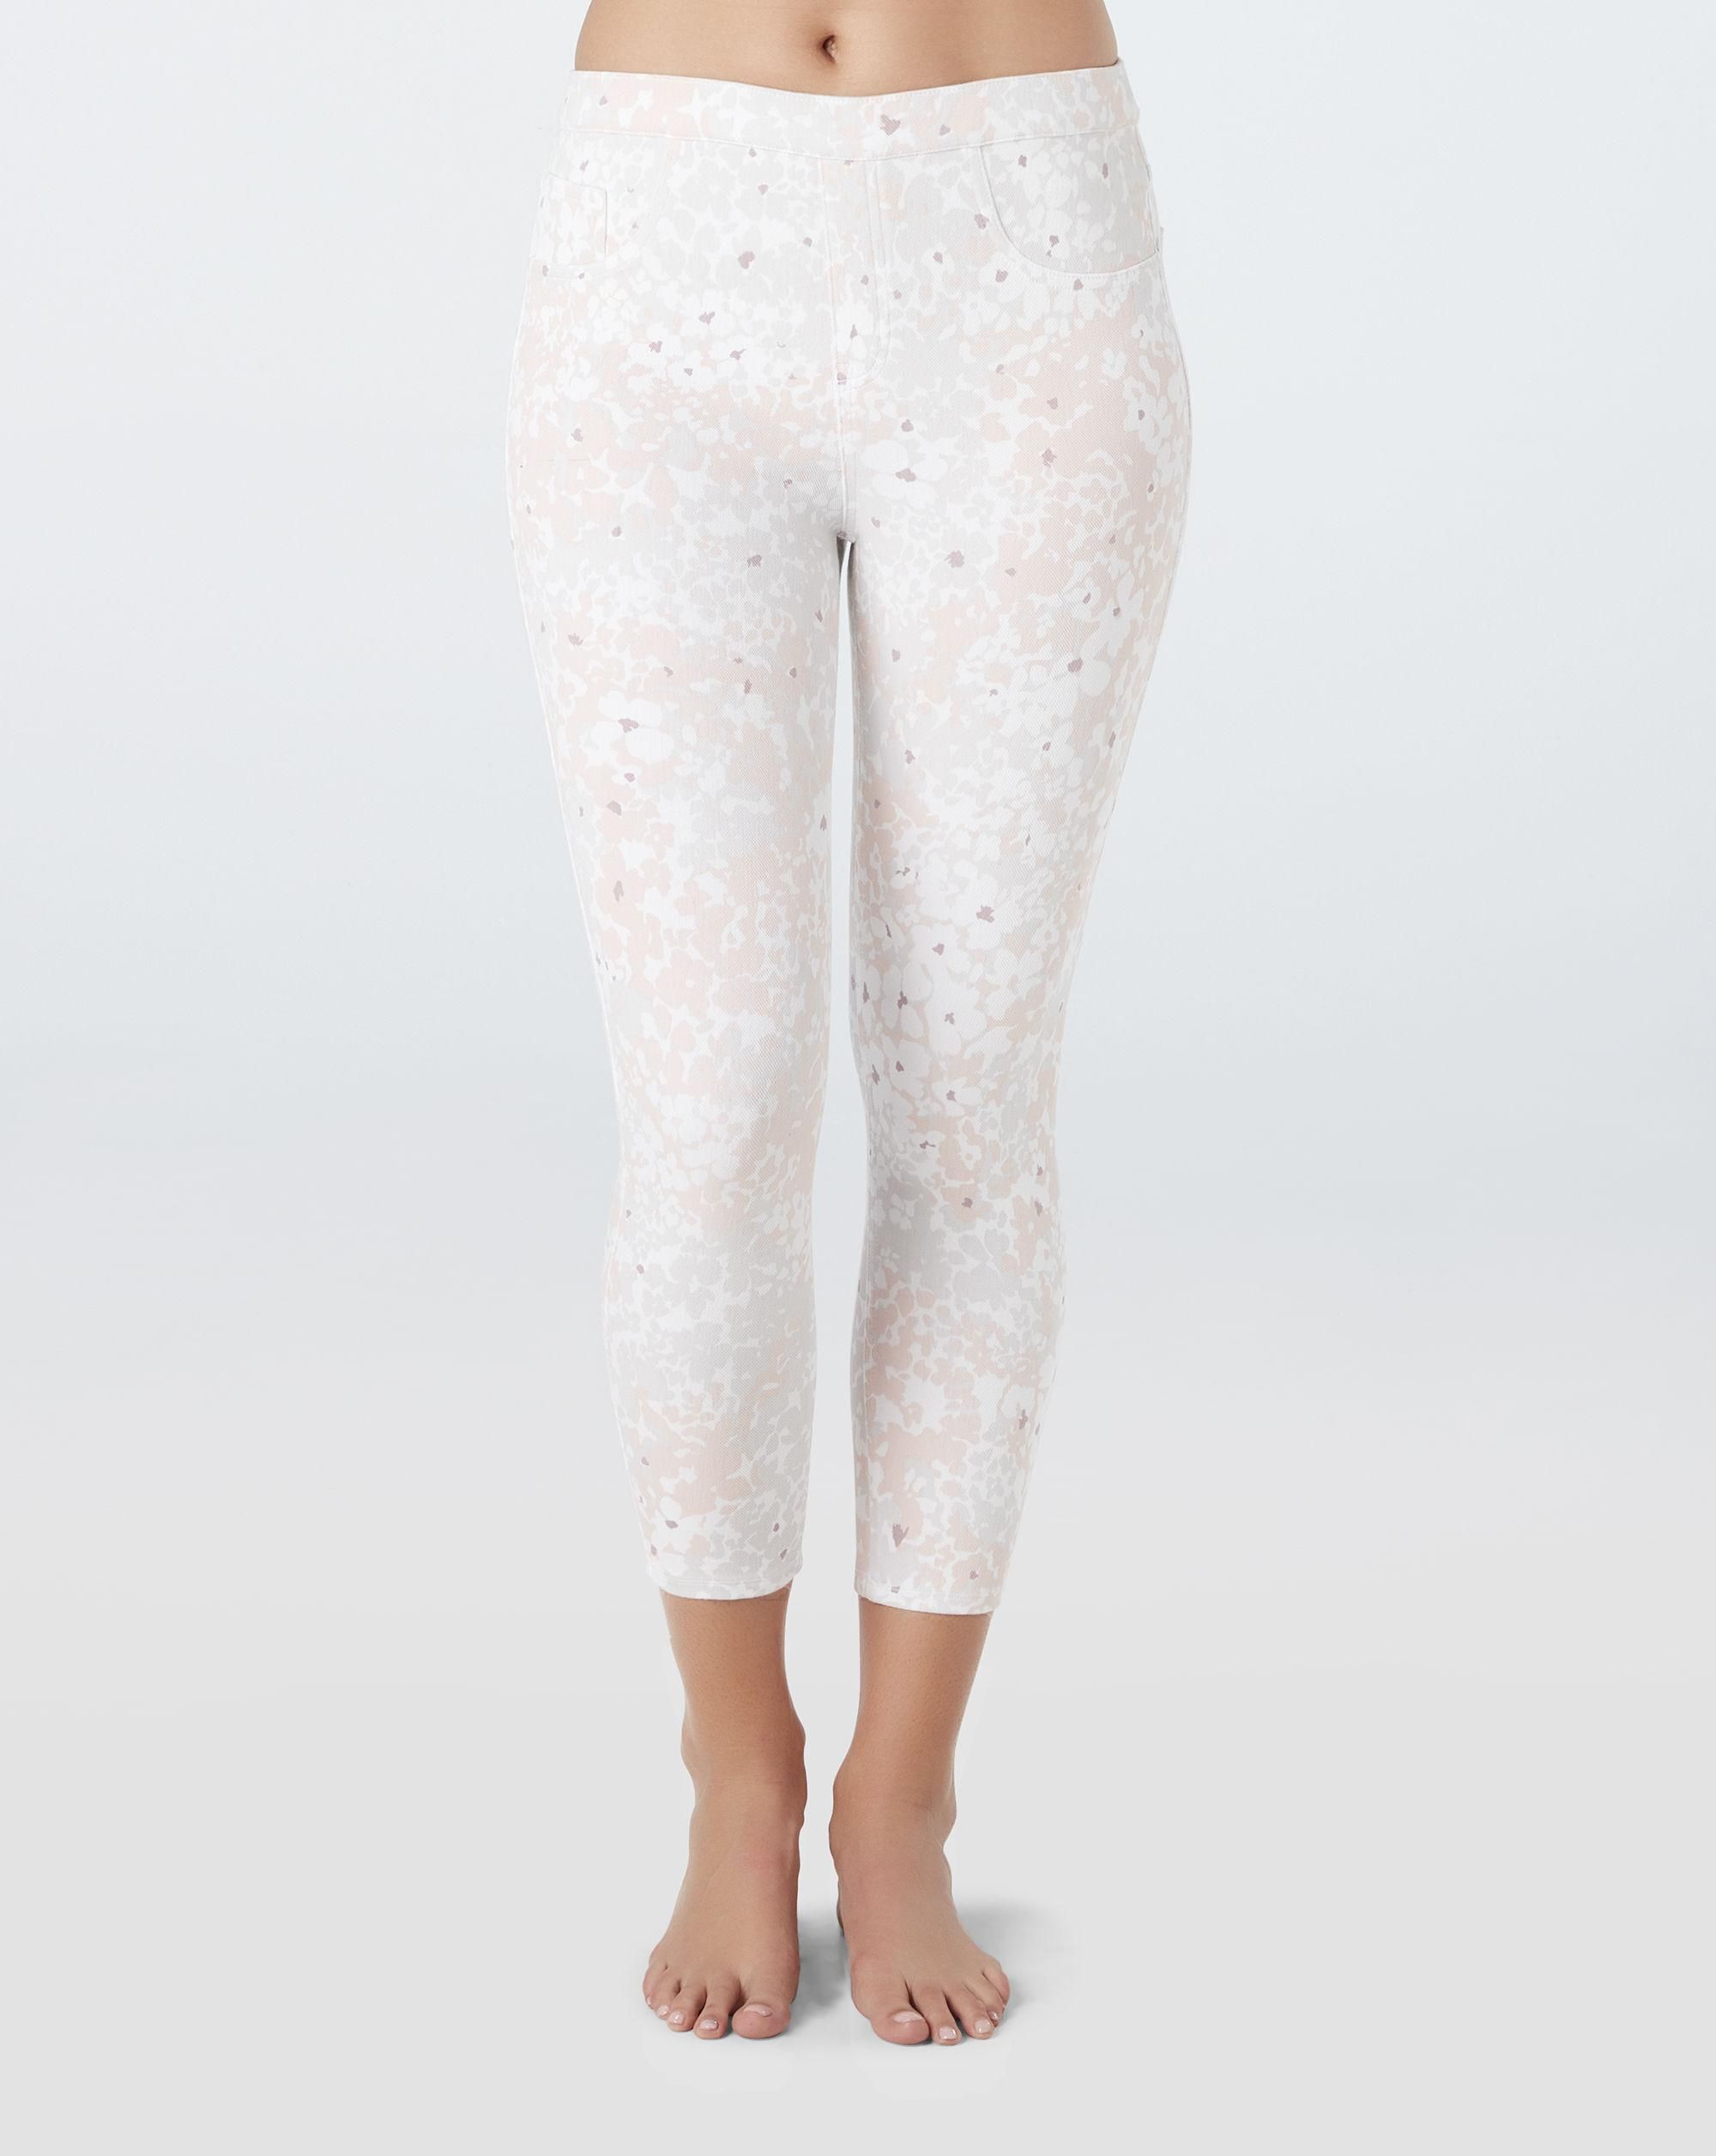 c2db29de27d7b1 #fashion #trends #styles #AdoreWe #Spanx - #SPANX Spanx Jean-Ish Cropped  Leggings Blush Petal - Size XS - AdoreWe.com